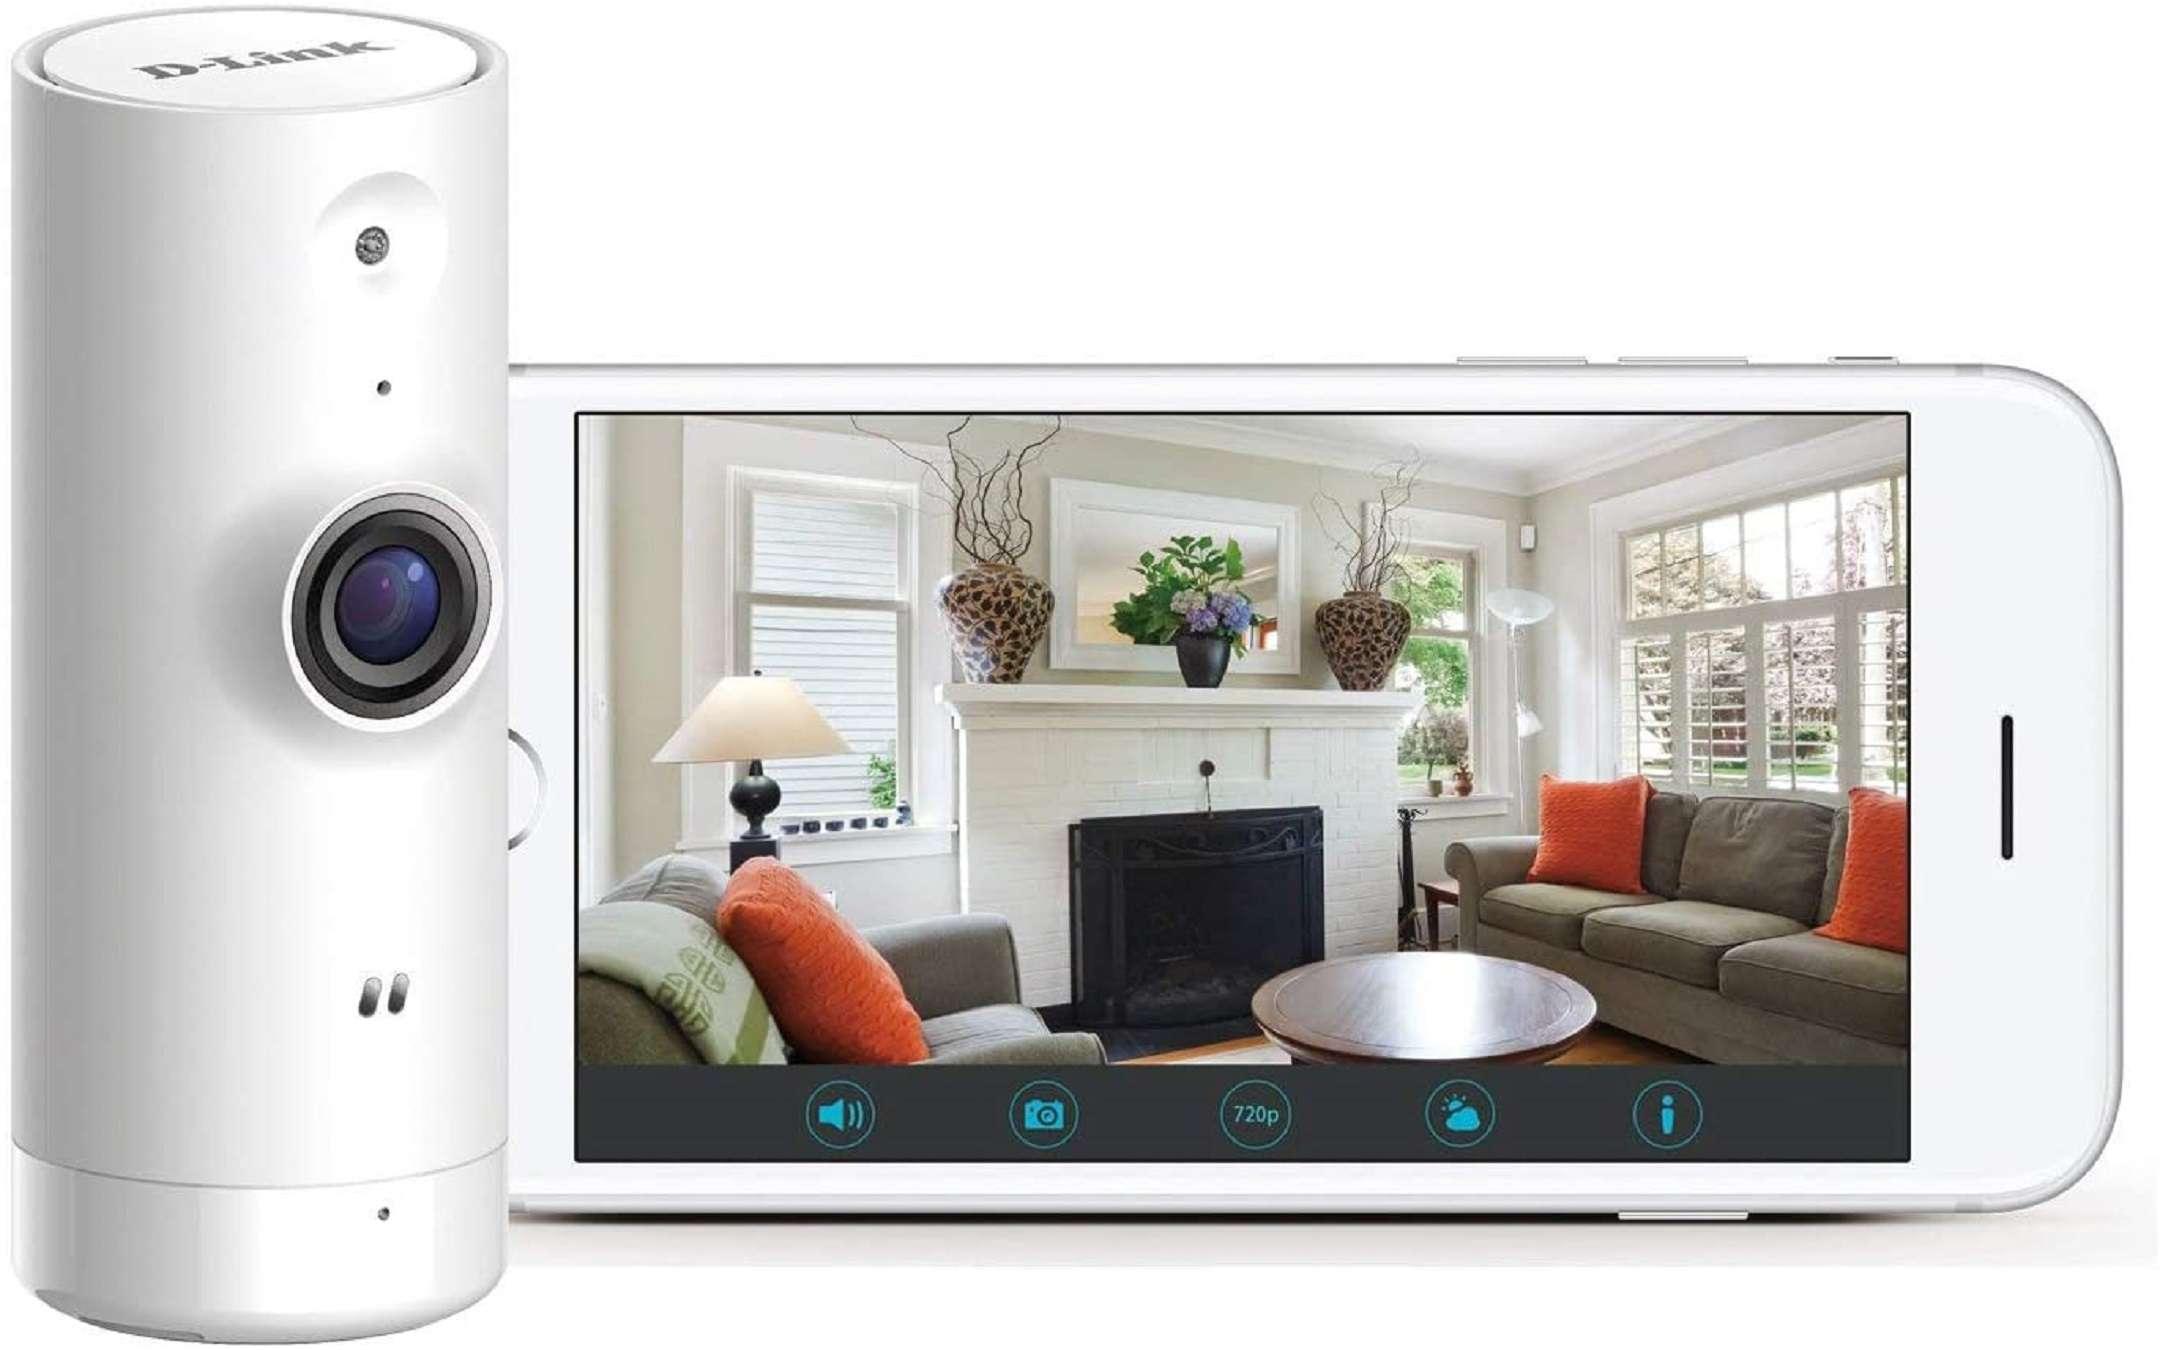 50% off D-Link indoor surveillance camera